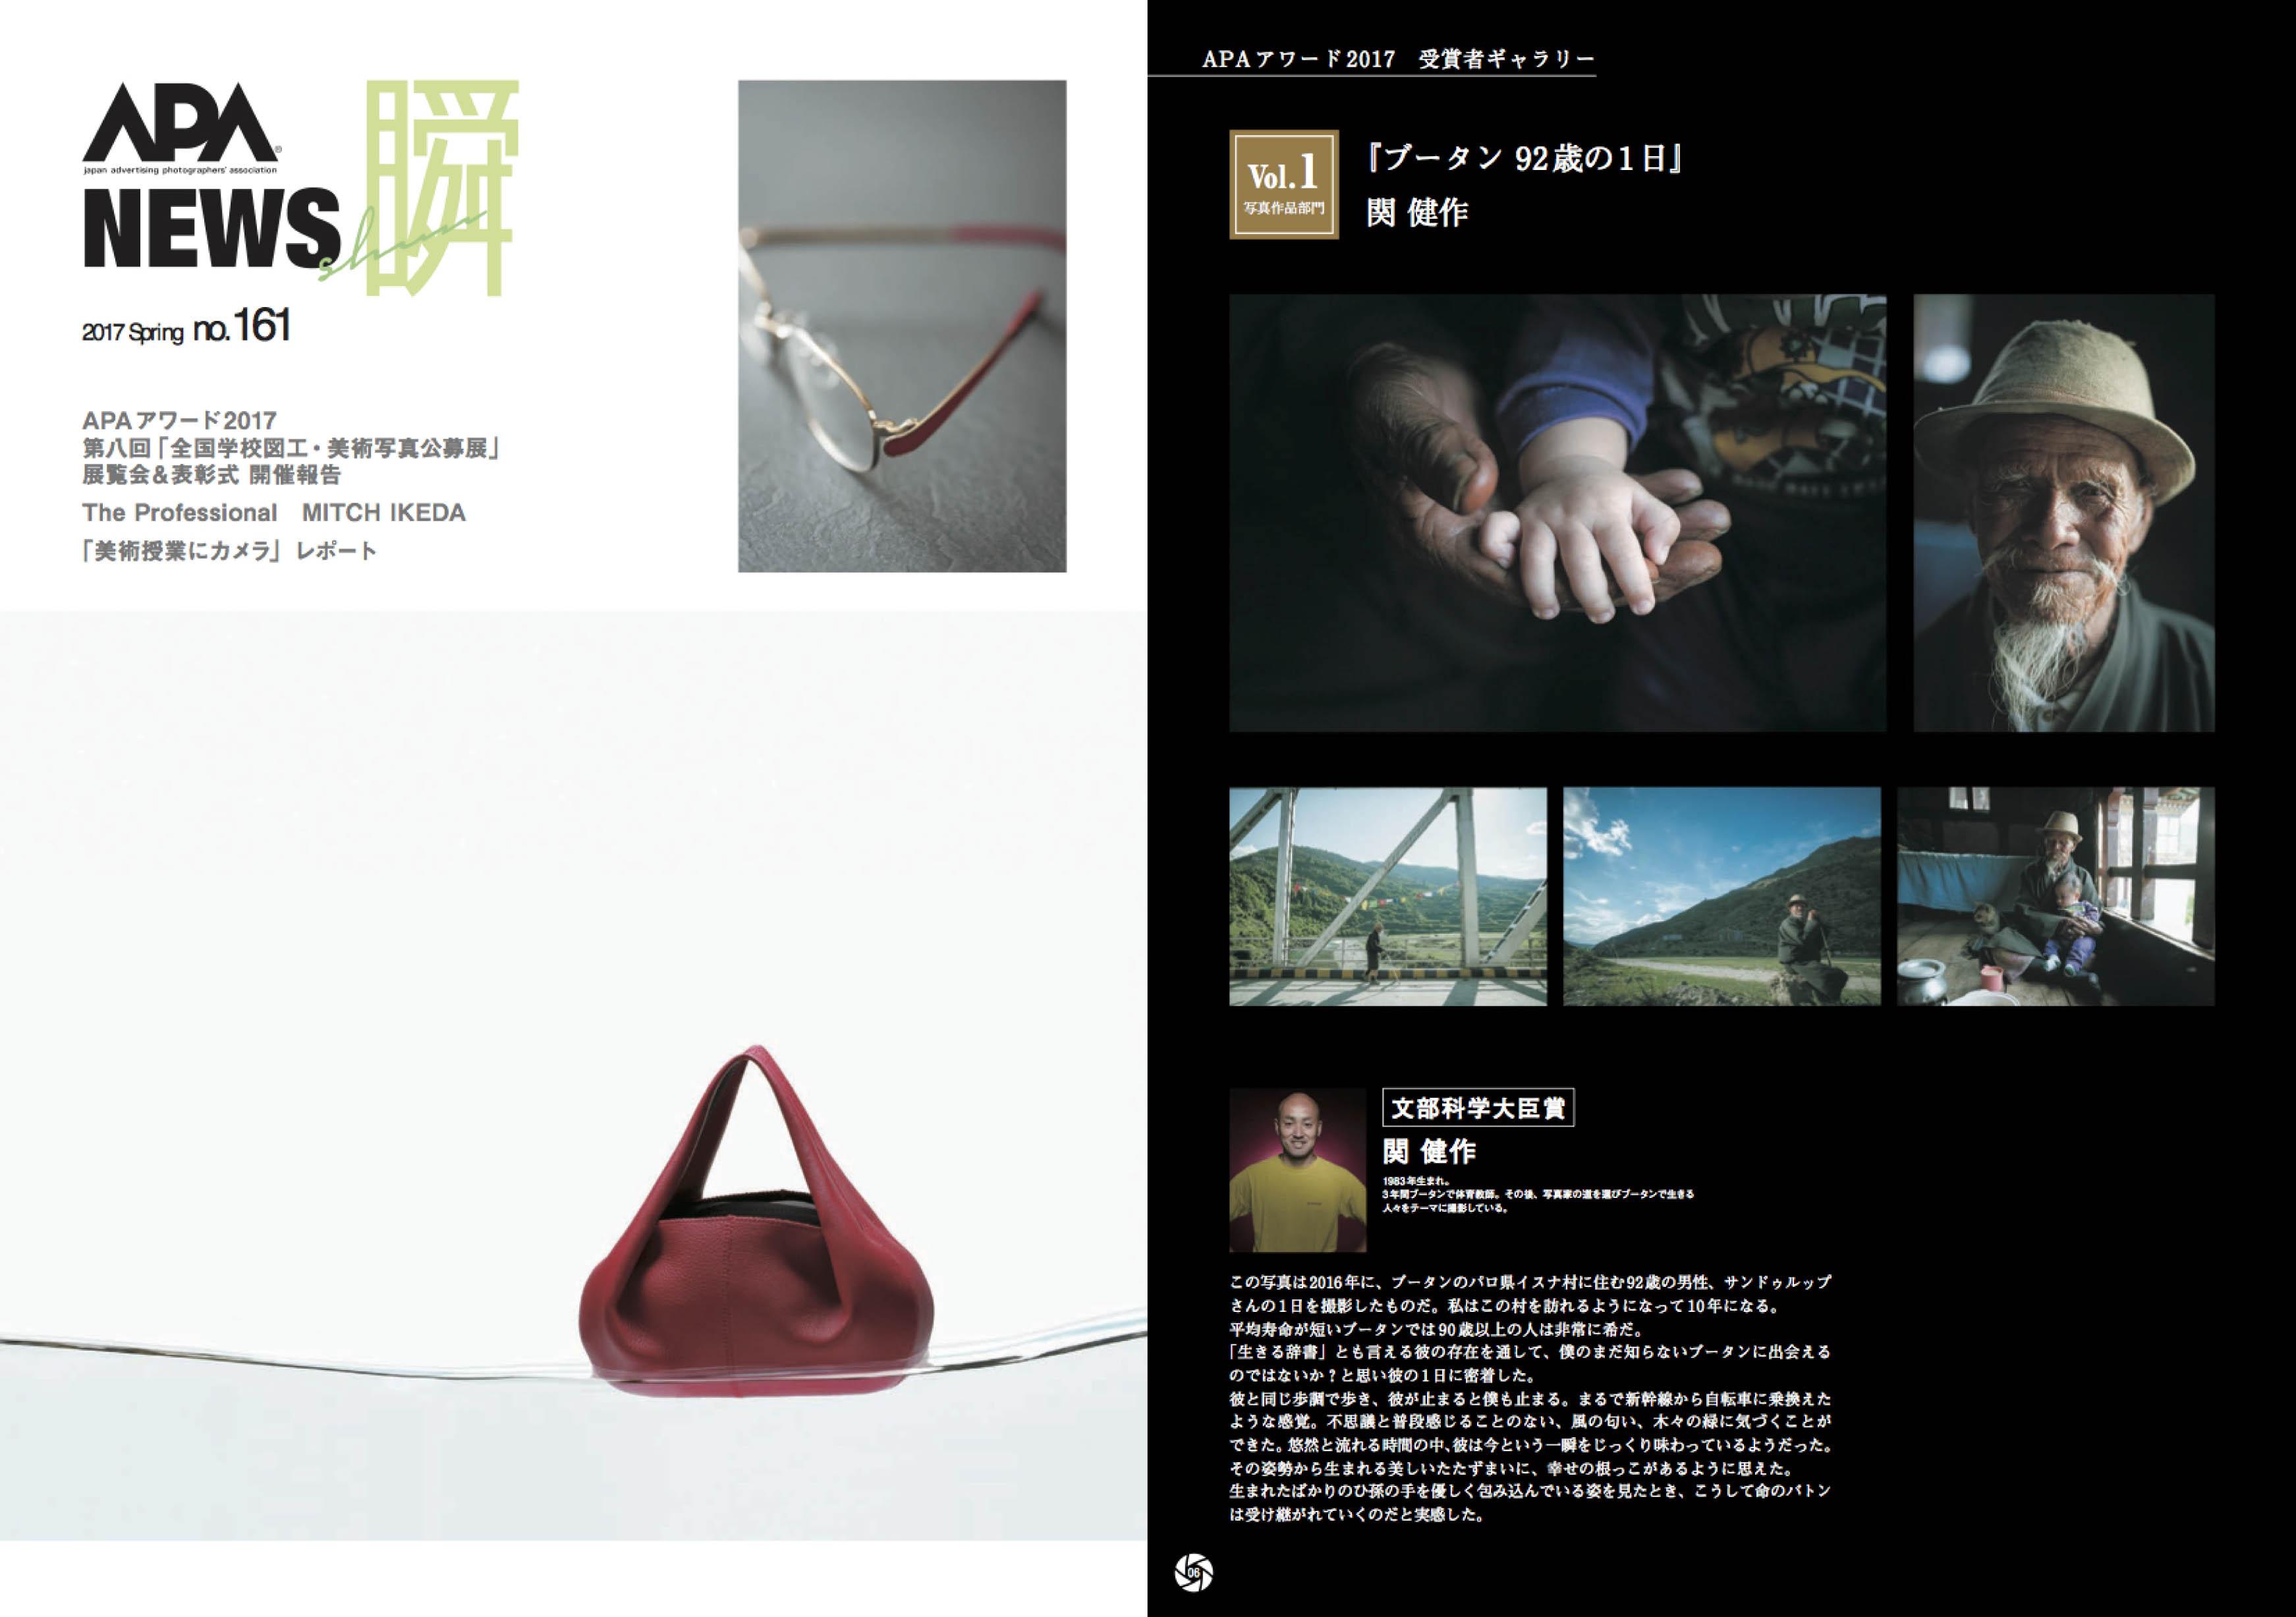 APA News 瞬 2017 Spring